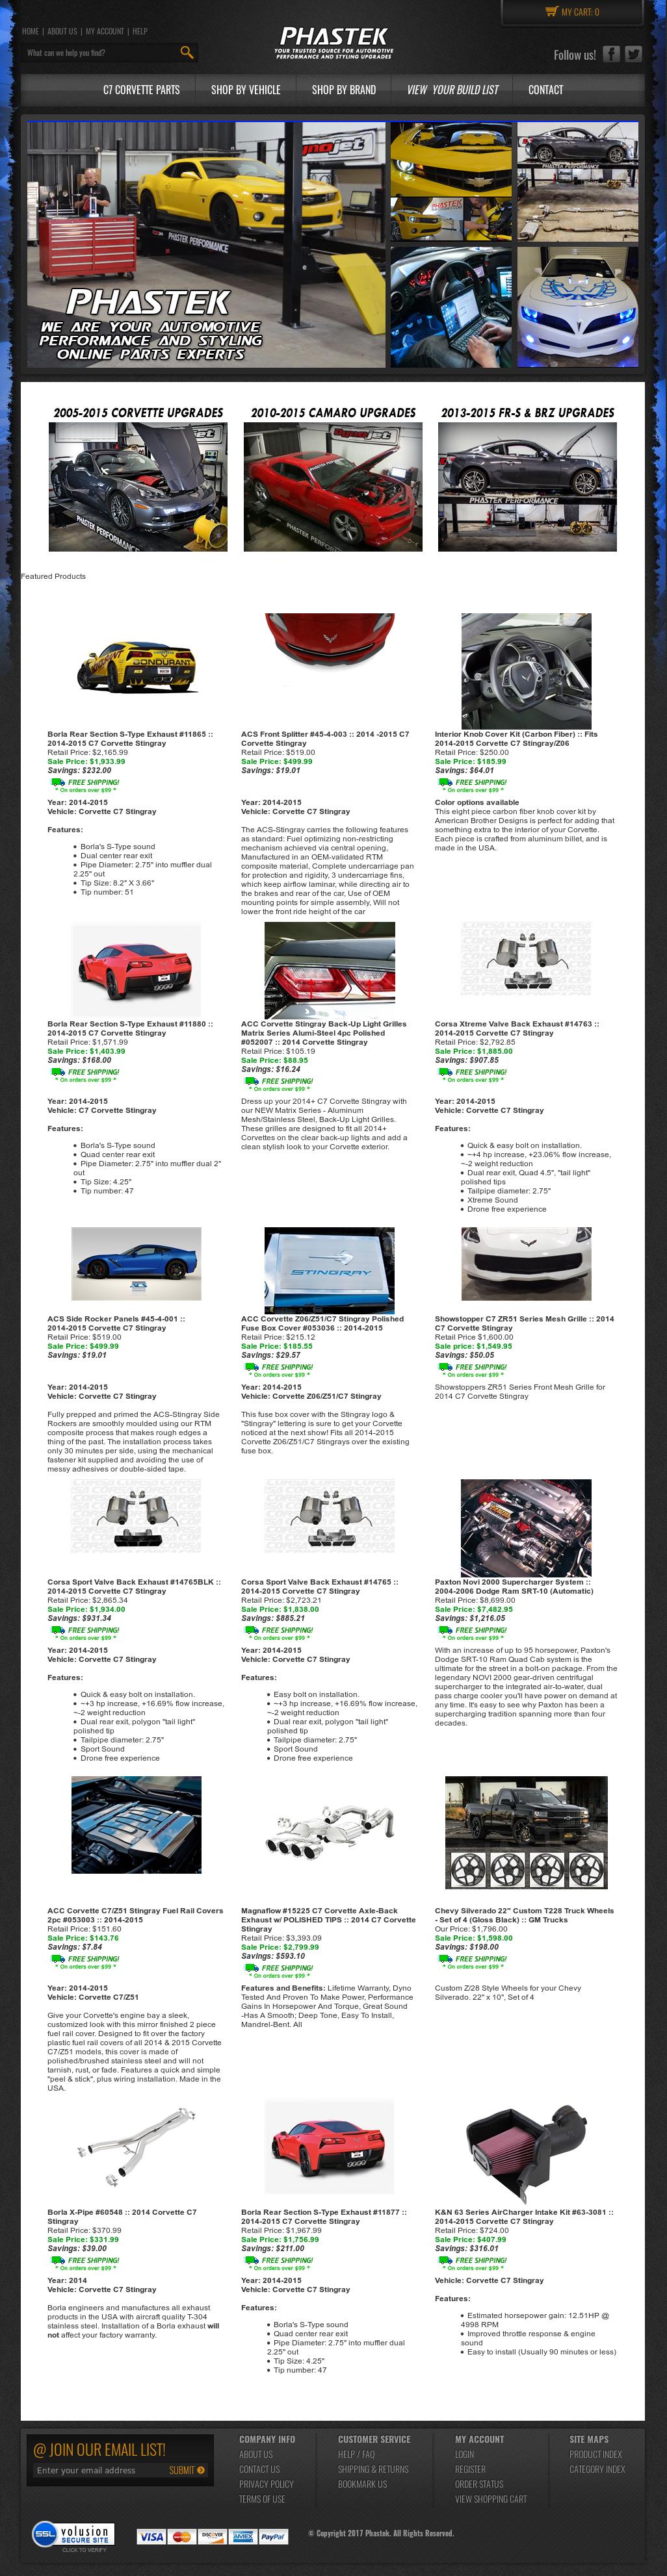 Phastek Competitors Revenue And Employees Owler Company Profile C7 Corvette Fuse Box Picture Website History